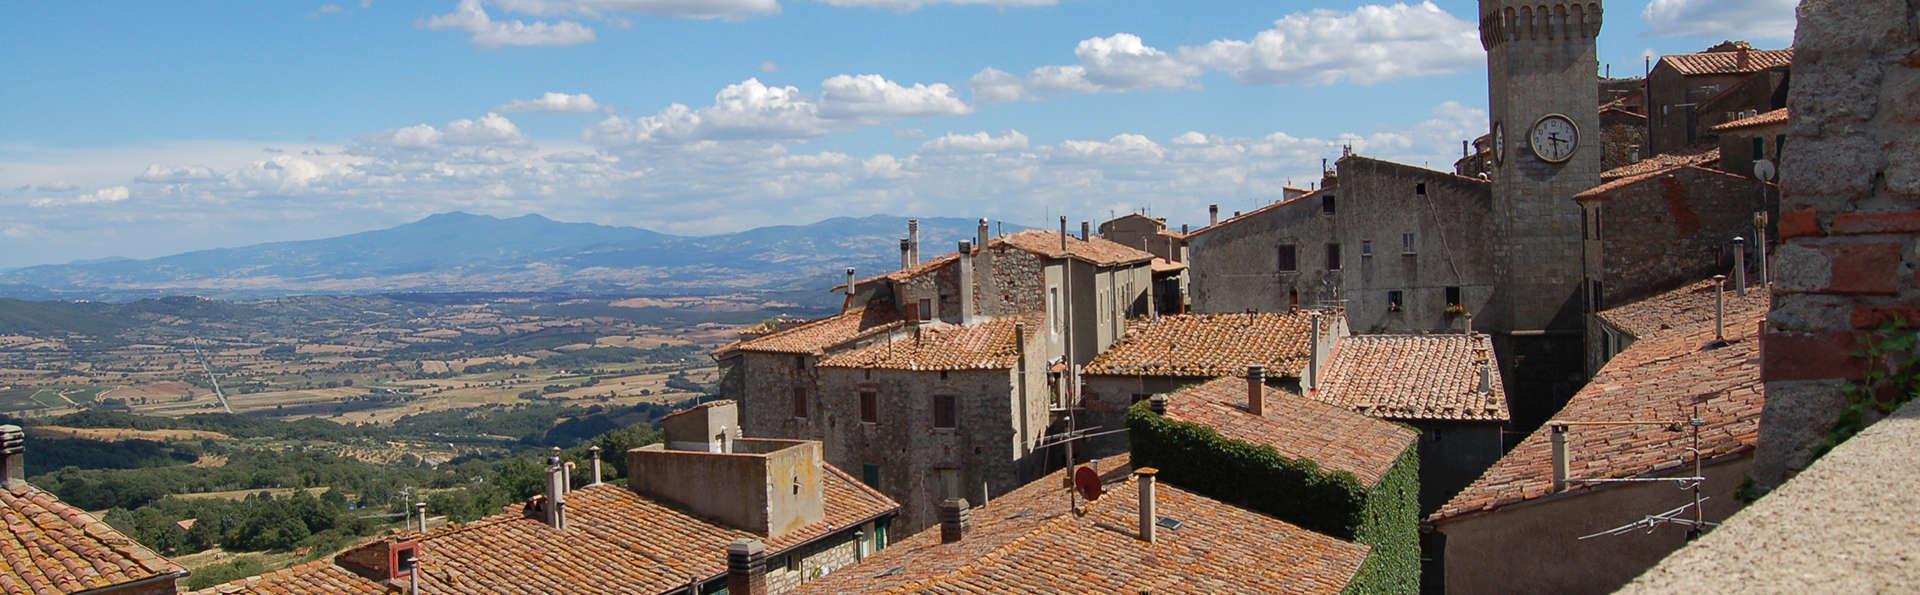 Hotel Residence Sant'Uberto - edit_Fotolia_2689539_roccastrada.jpg